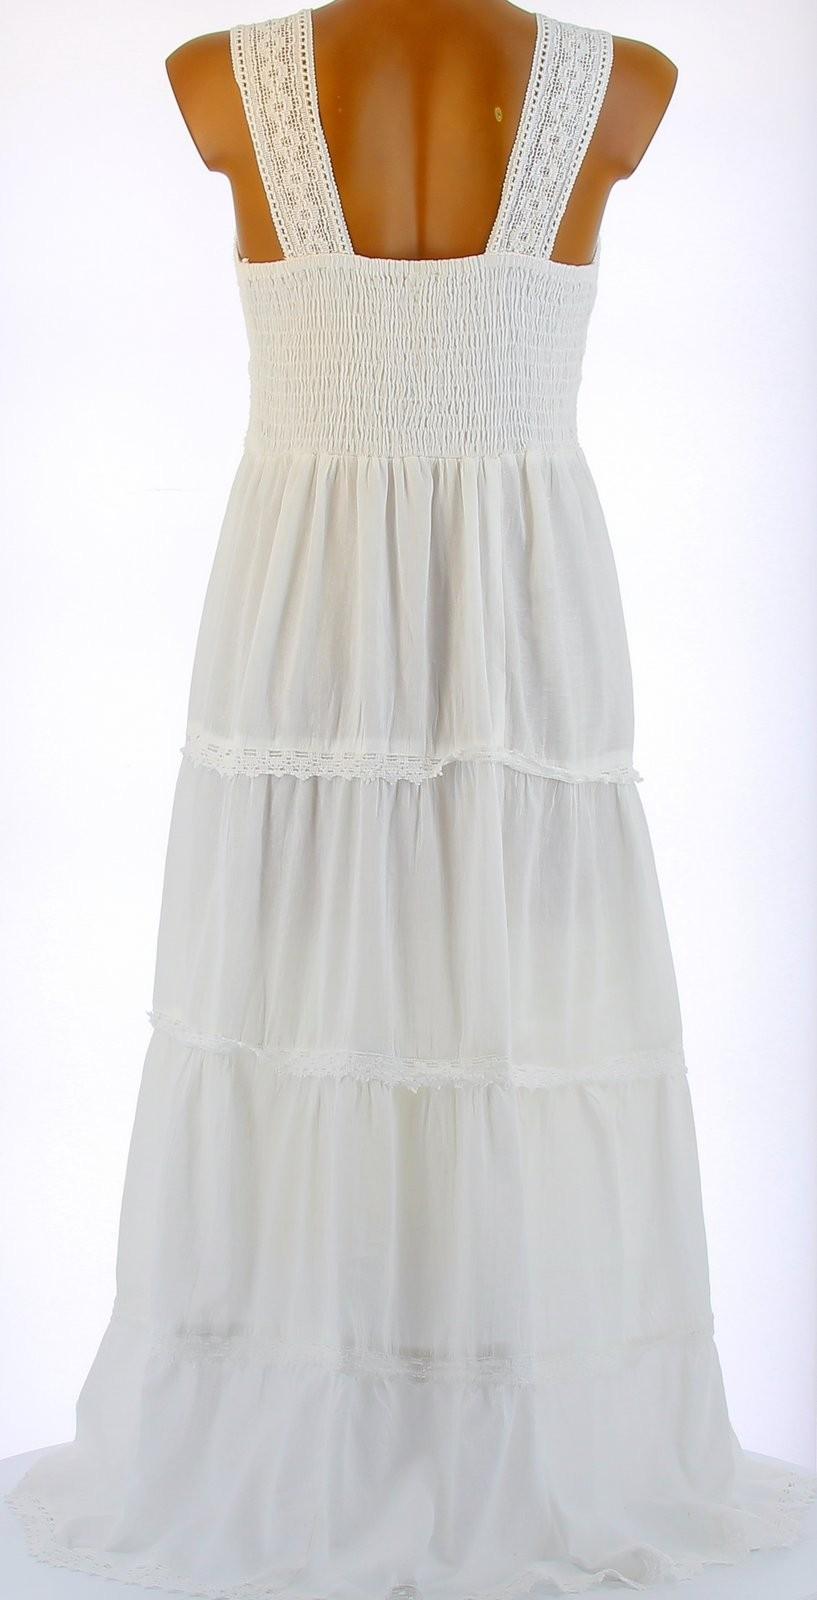 robe longue t dentelle coton boho blanche adriana. Black Bedroom Furniture Sets. Home Design Ideas